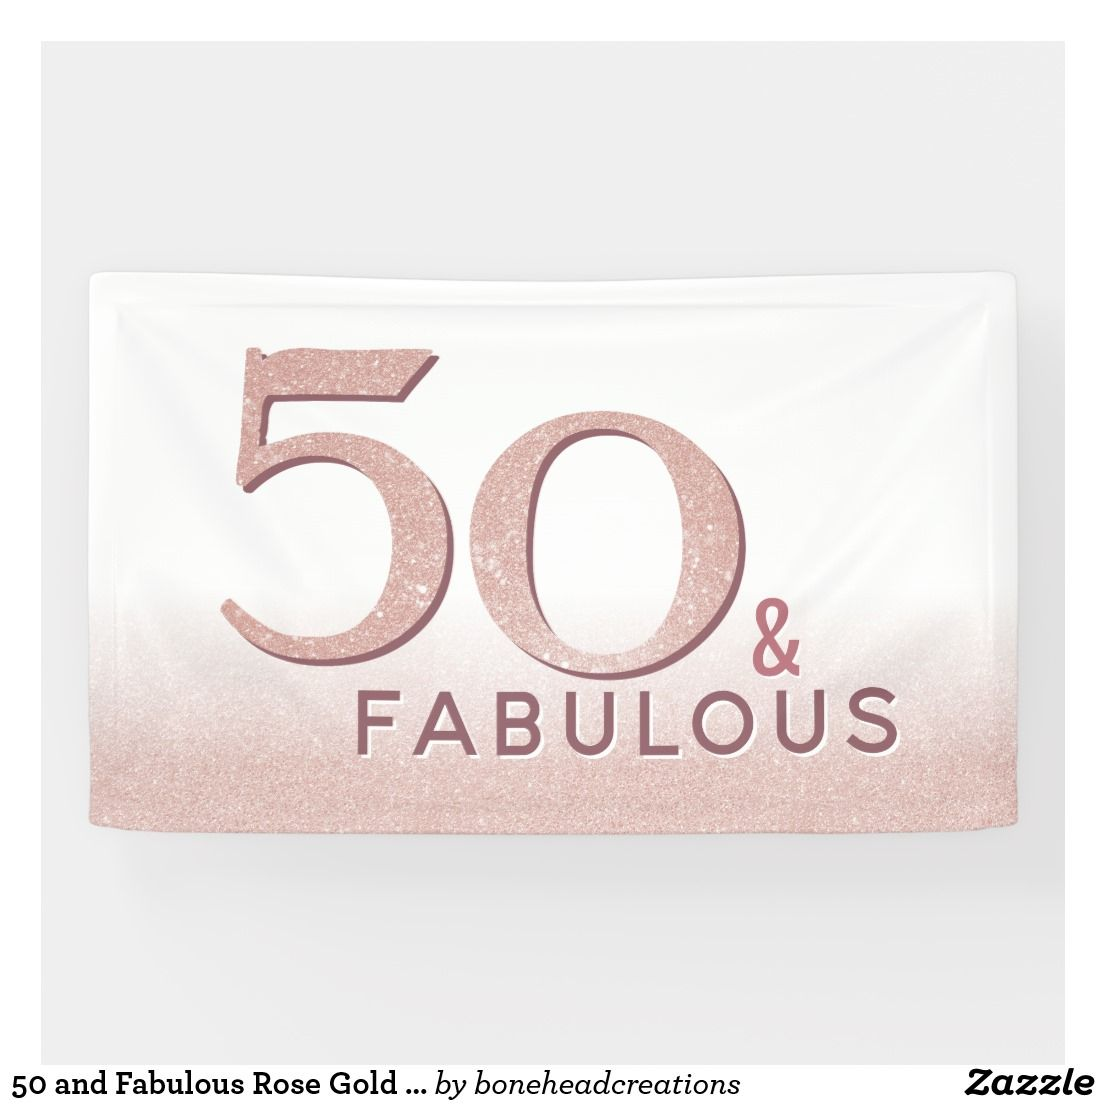 50 and Fabulous Rose Gold Birthday Modern Backdrop Banner #goldglitterbackground